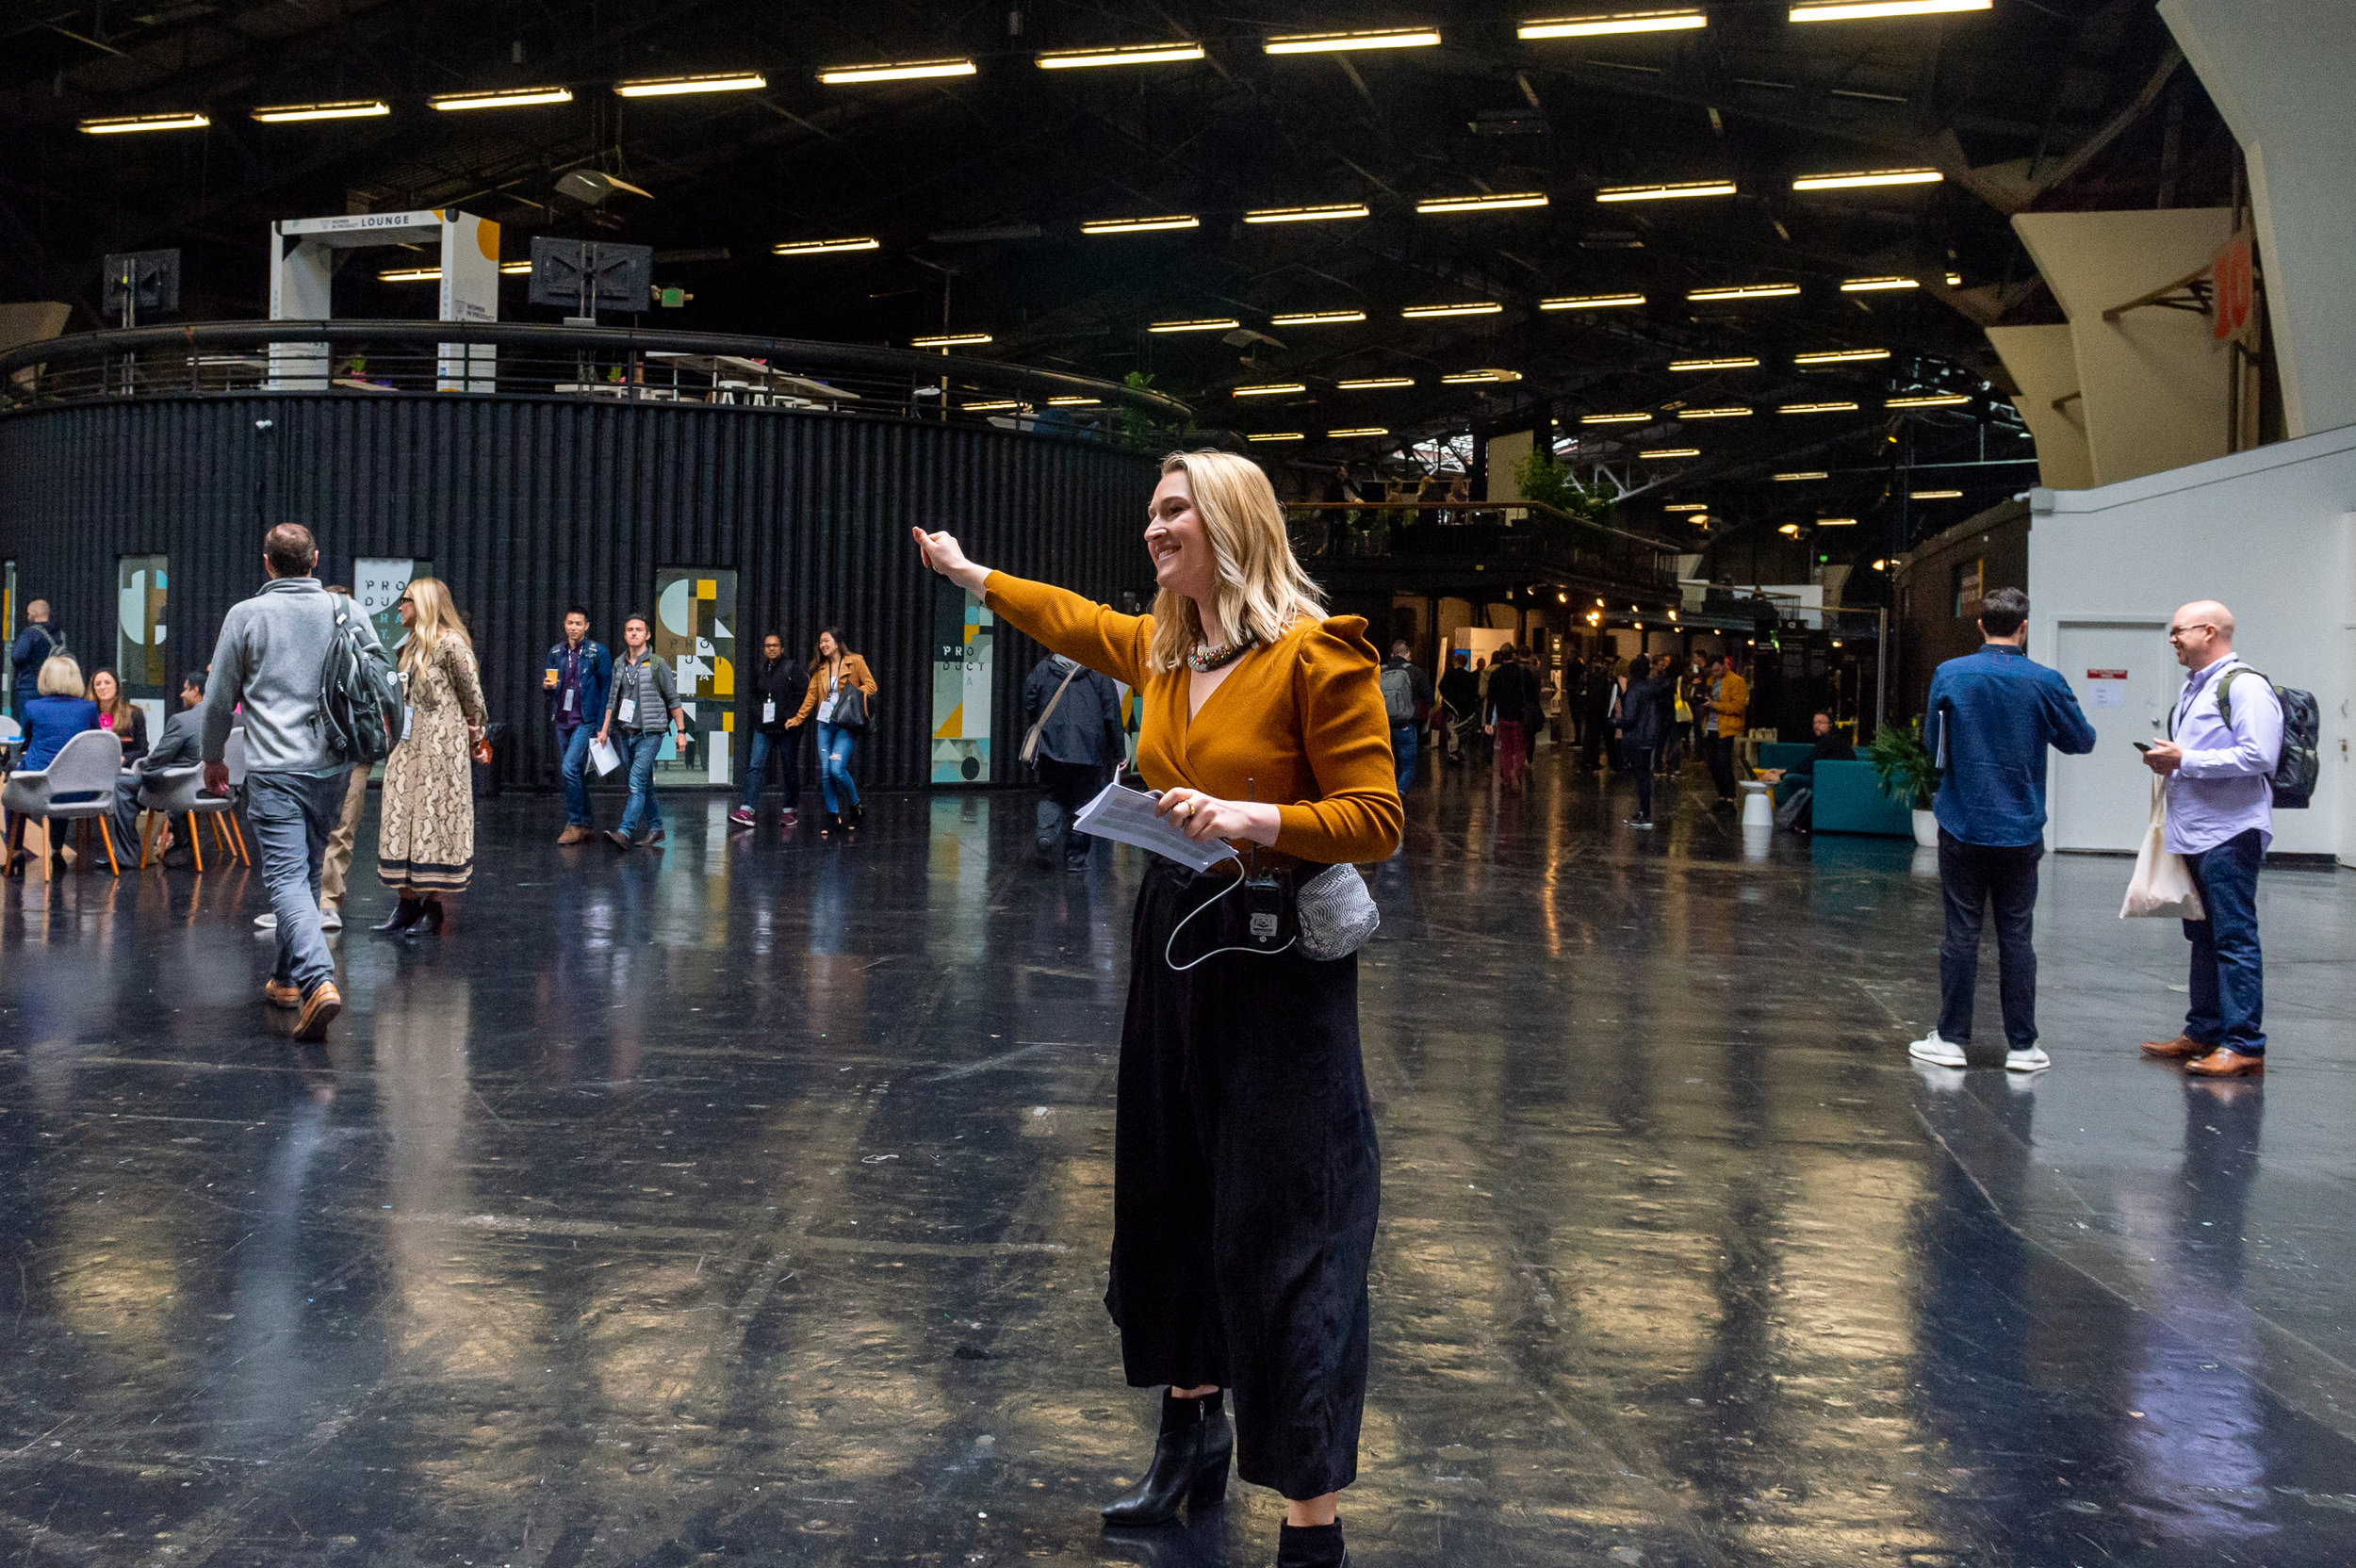 Chloe-Jackman-Photography-Palace-Of-Fine-Arts-Event-2019-254.JPG